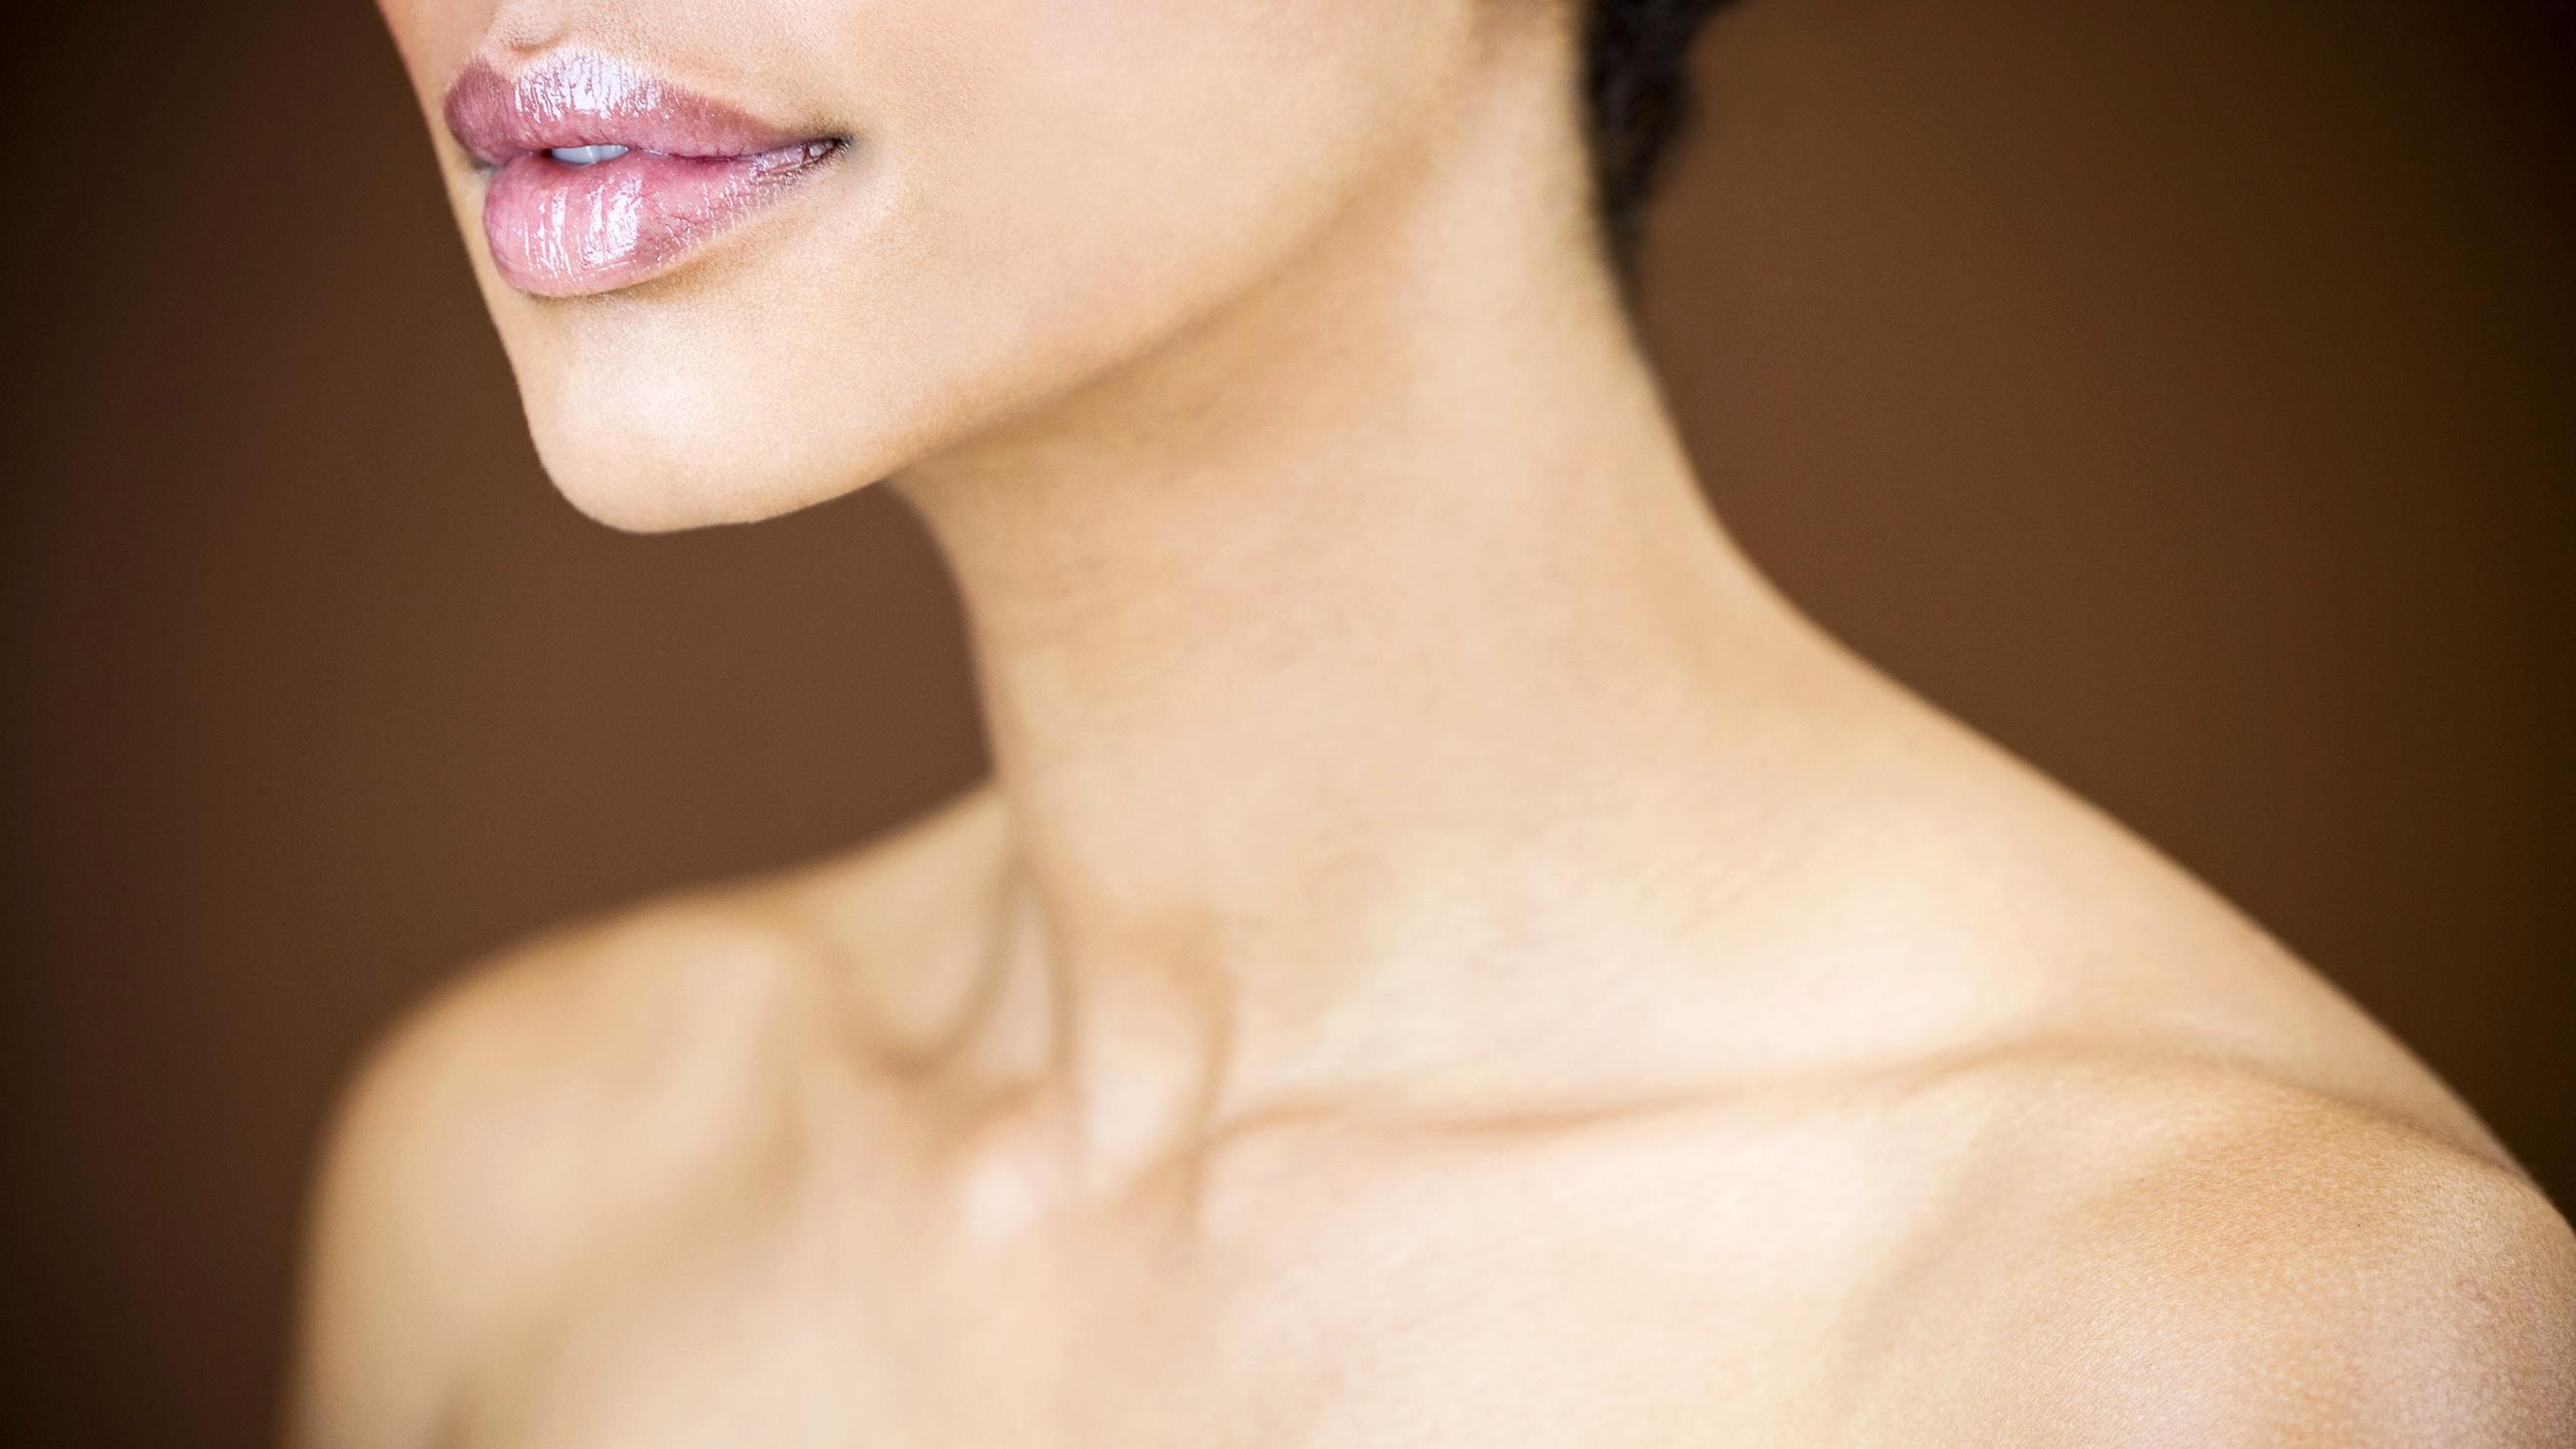 шея и плечи картинки женщин издревле